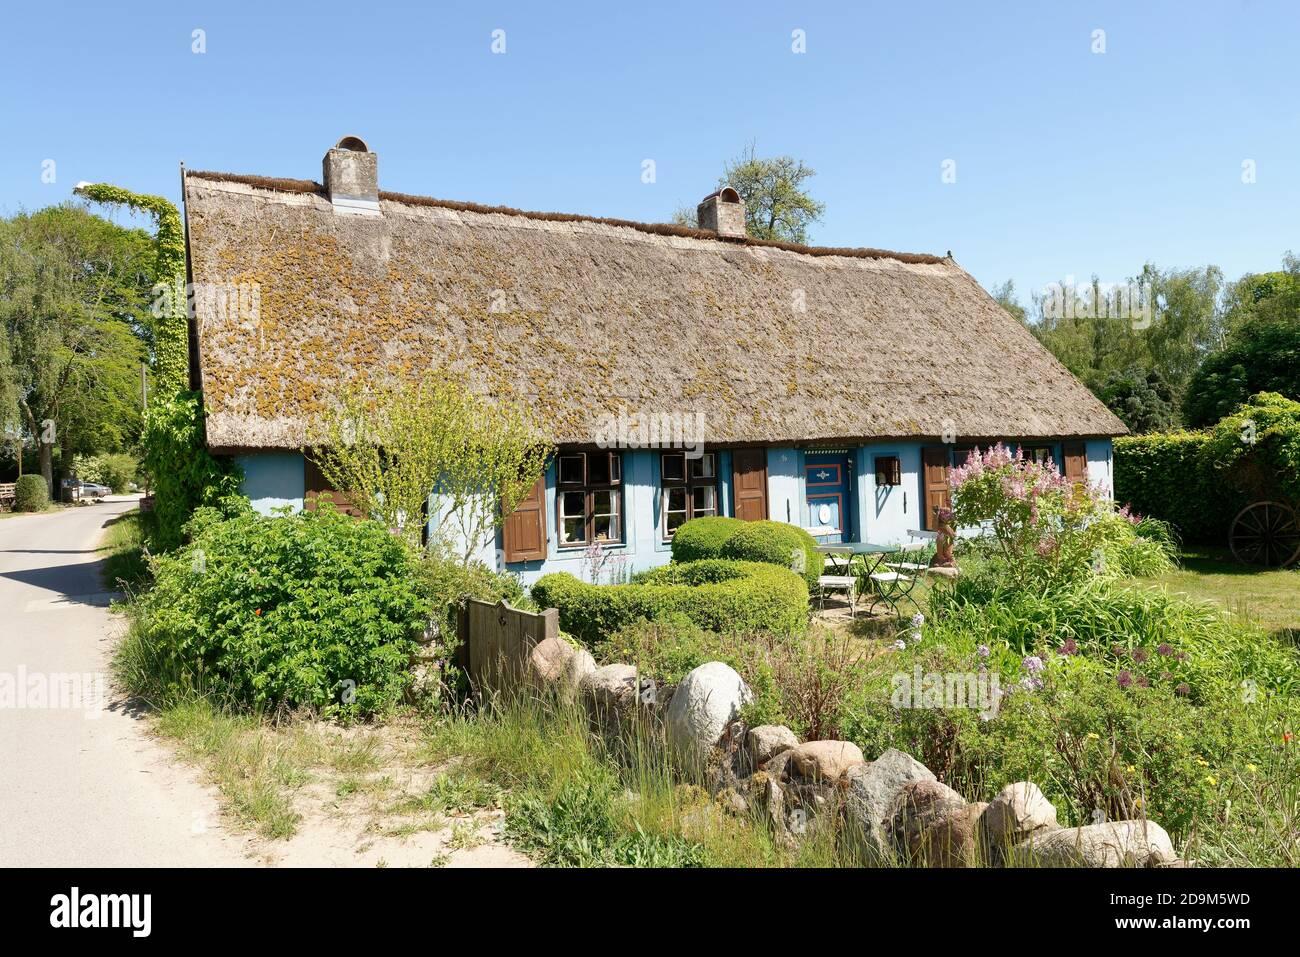 """Blue House"" in Warthe on the Lieper Winkel peninsula, Lieper Winkel, Usedom Island, Baltic Sea, Mecklenburg-Western Pomerania, Germany Stock Photo"